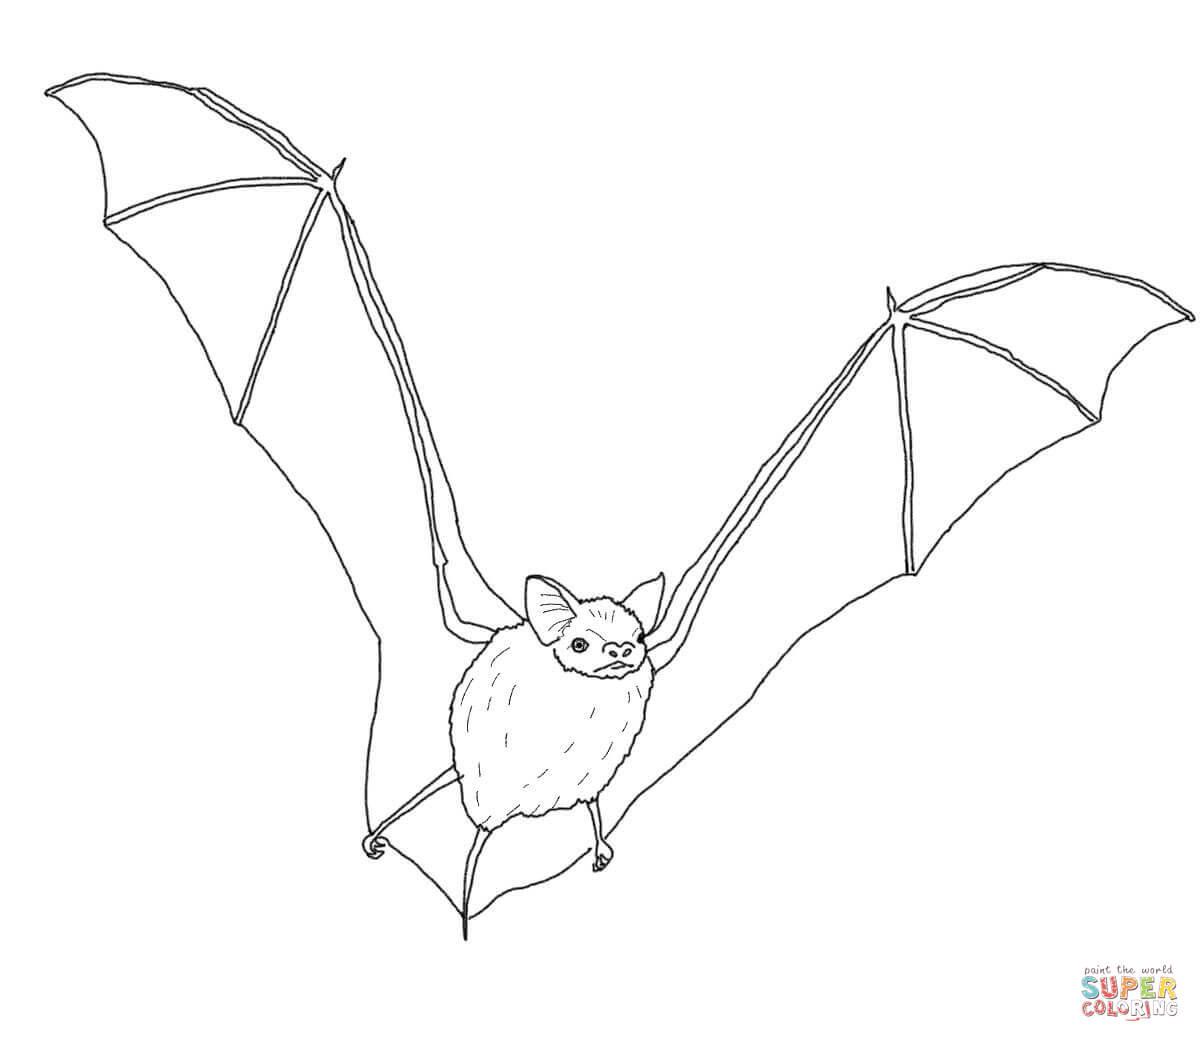 Große Braune Fledermaus